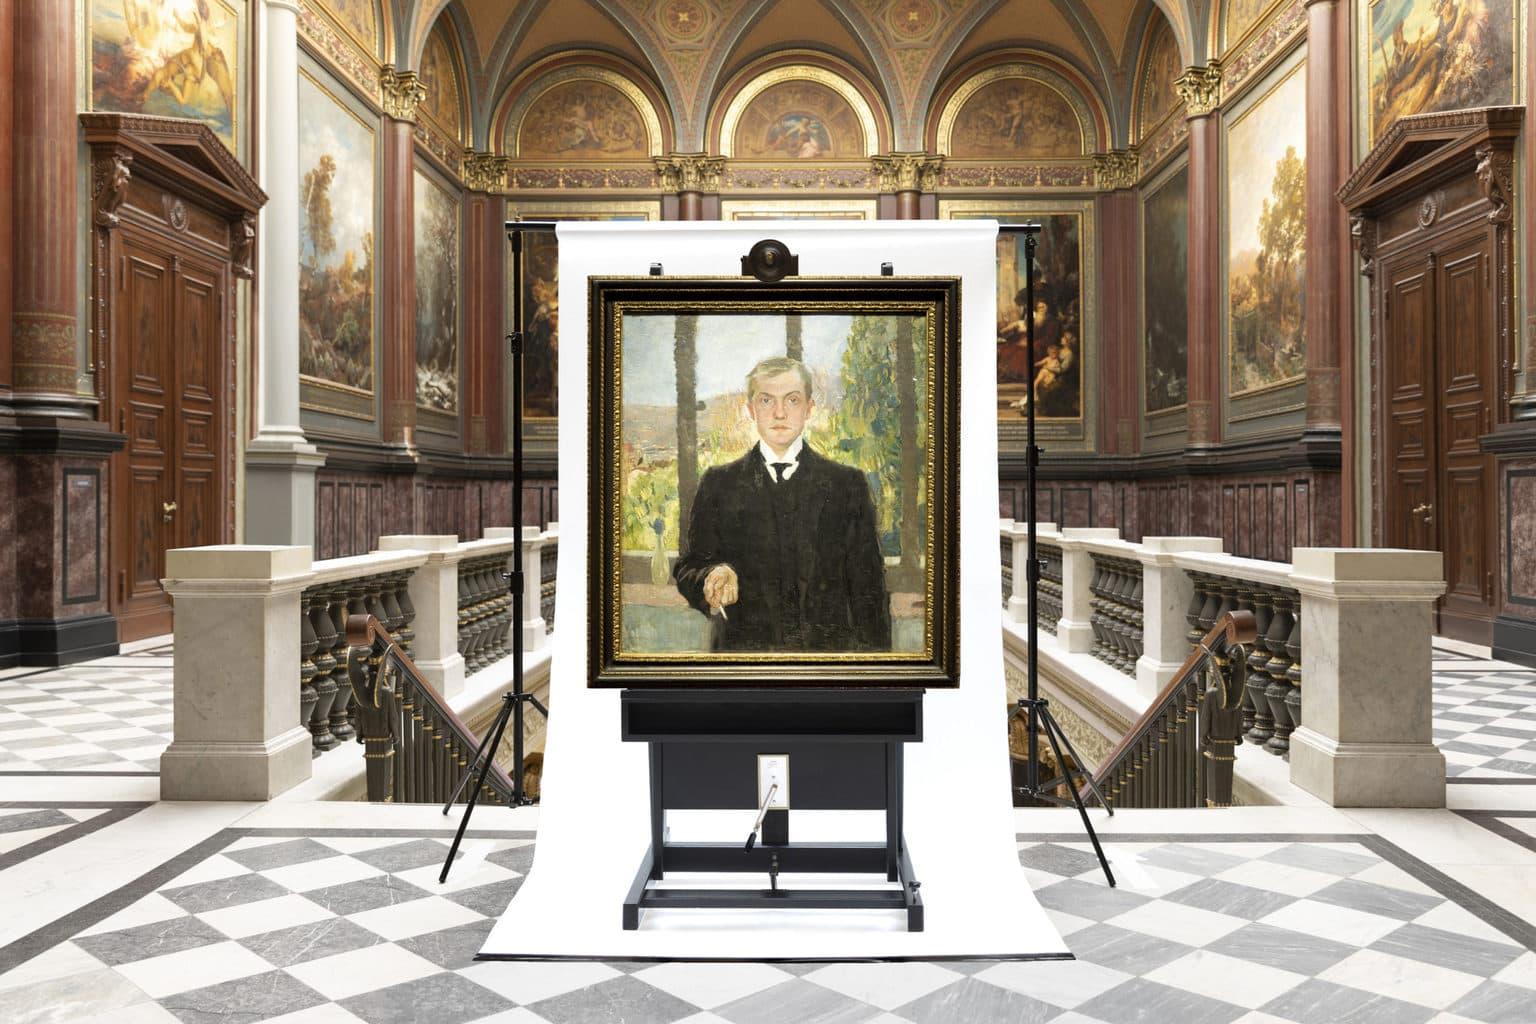 Zelfportret van Max Beckmann in kunsthal Hamburg